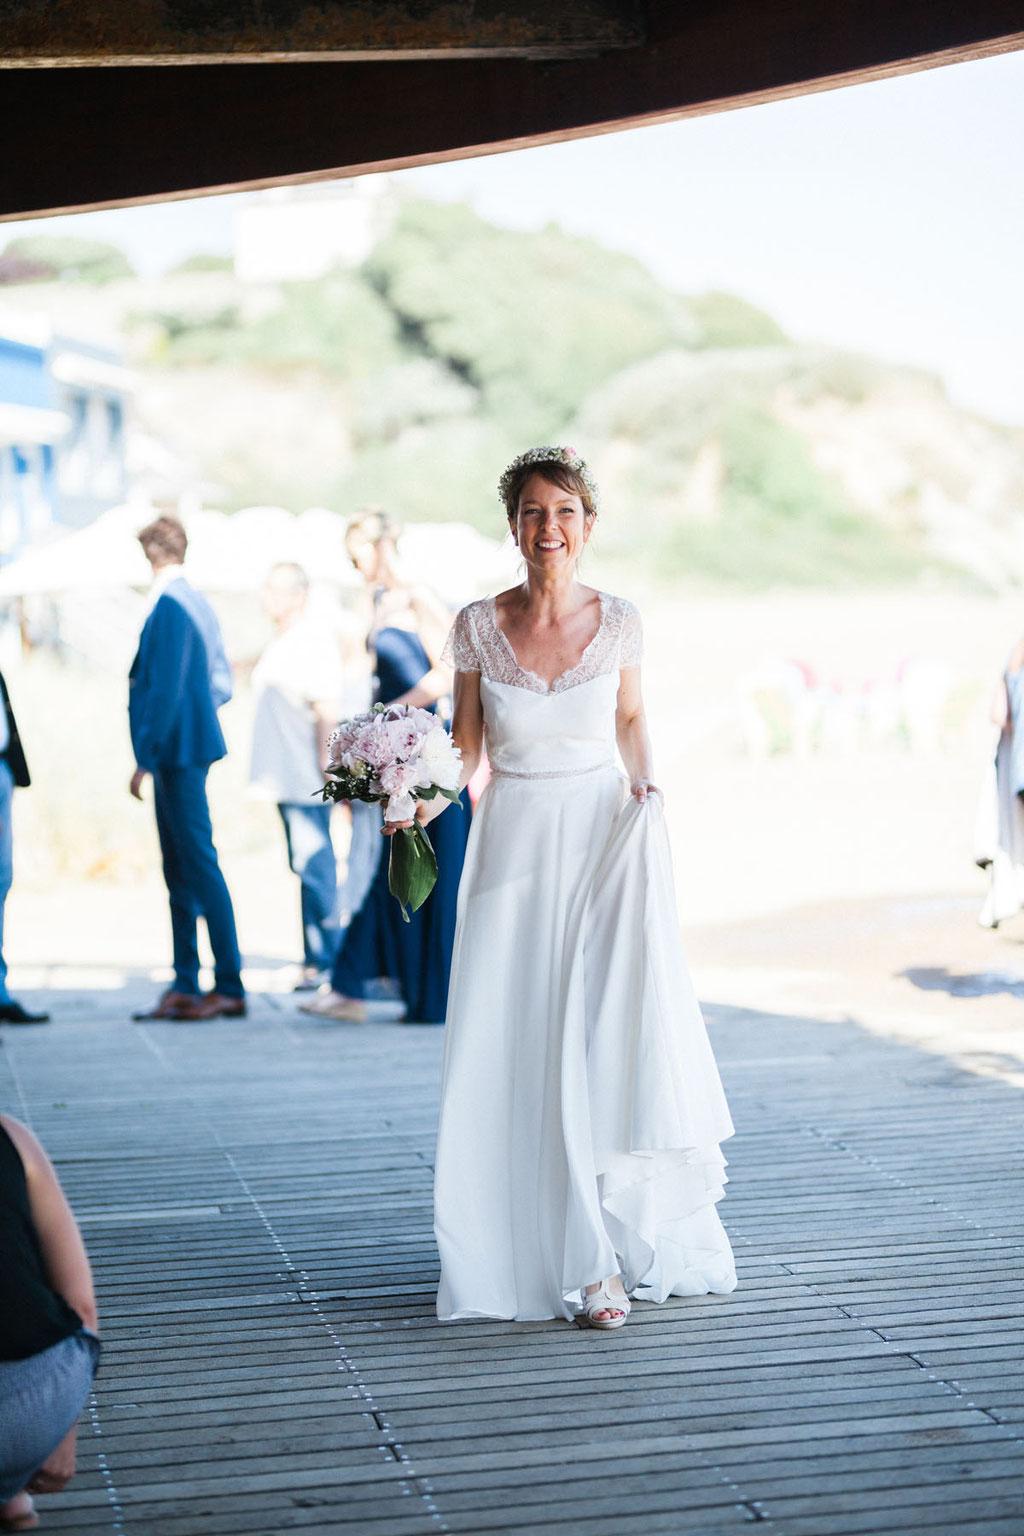 Photographe mariage nantes plage de monsieur hulot orlane-photos.com